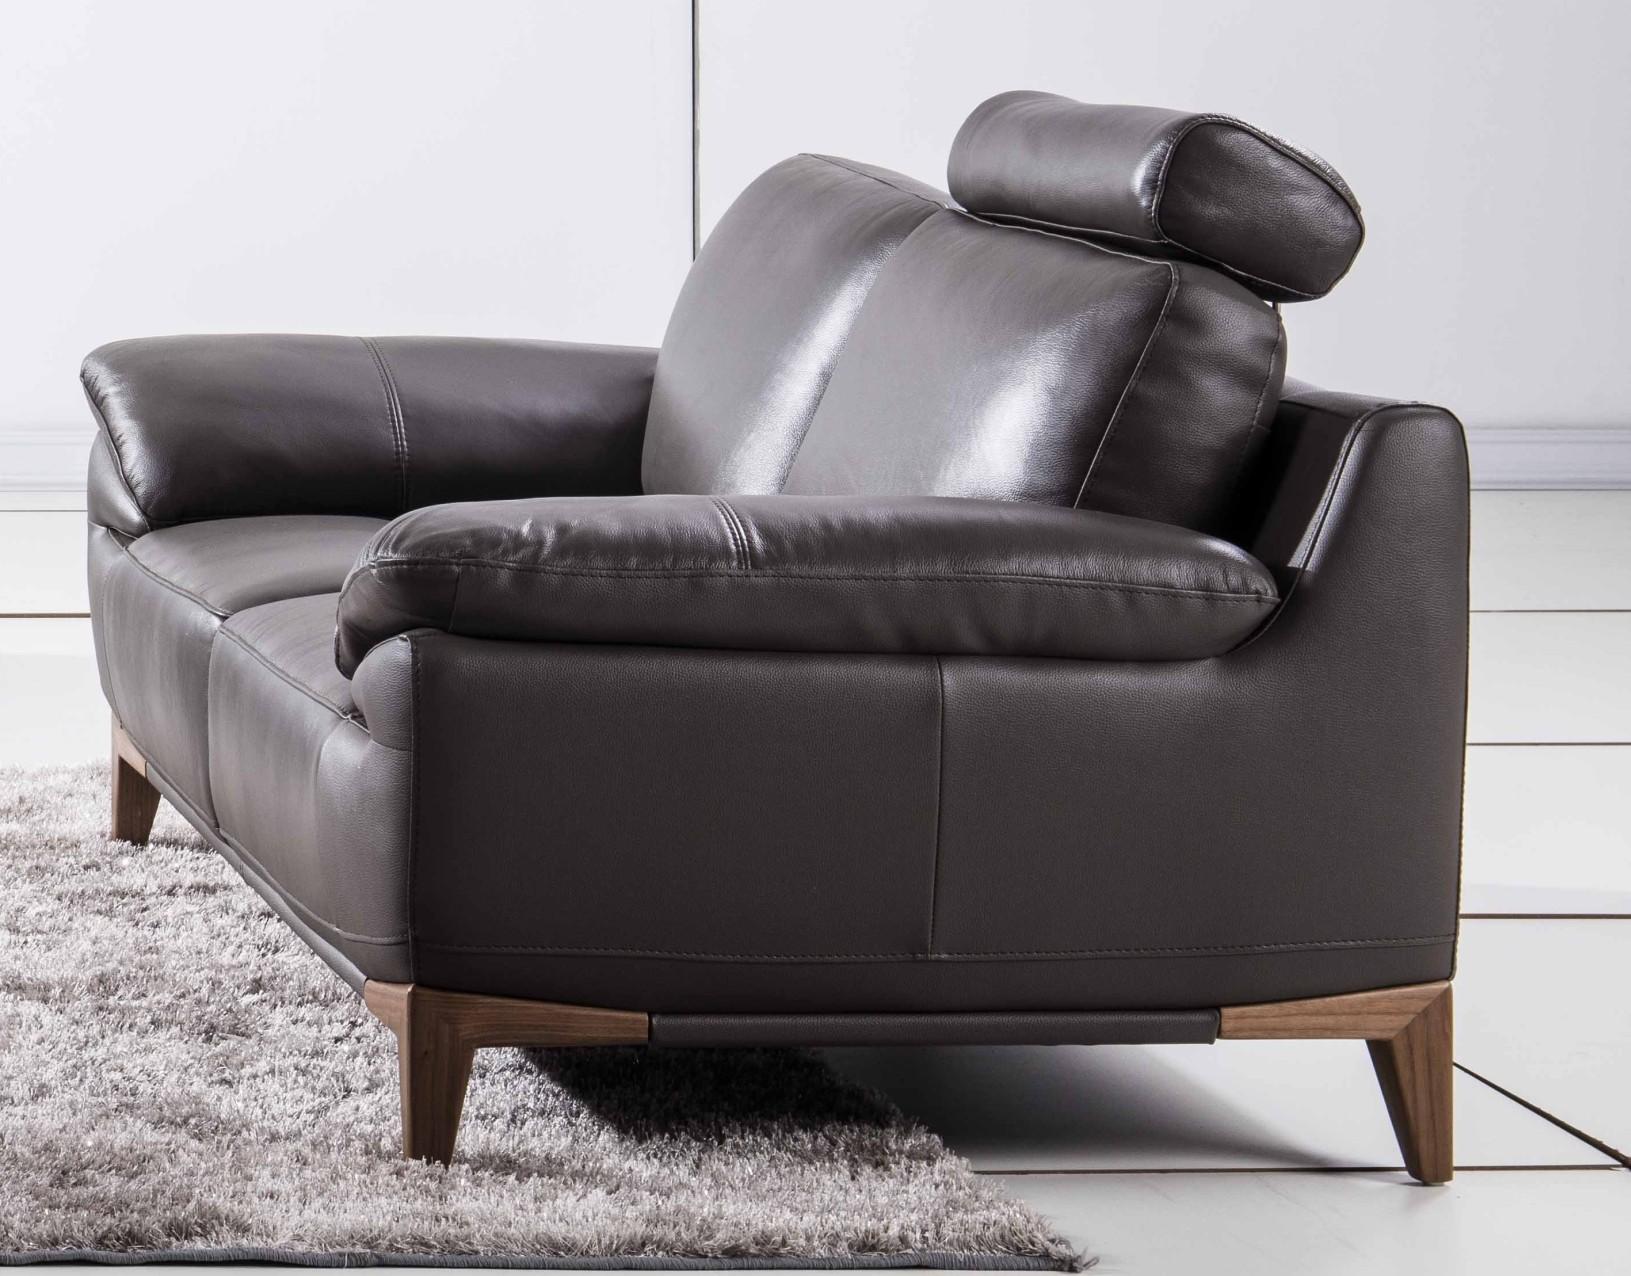 Mid Century Style Sofa With An Adjustable Headrest In Dark